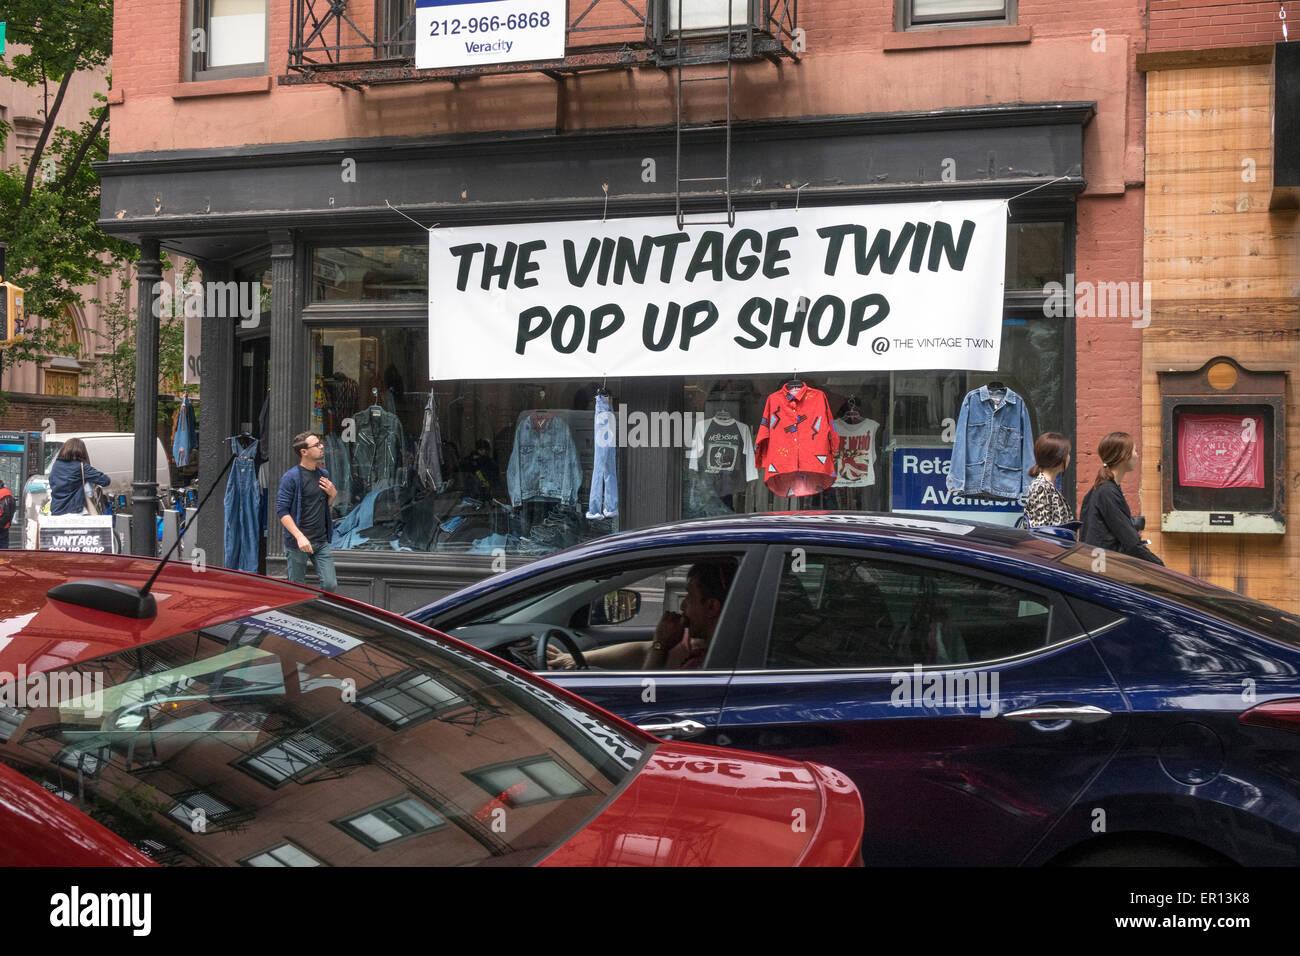 Pop Up Shop Stock Photos & Pop Up Shop Stock Images